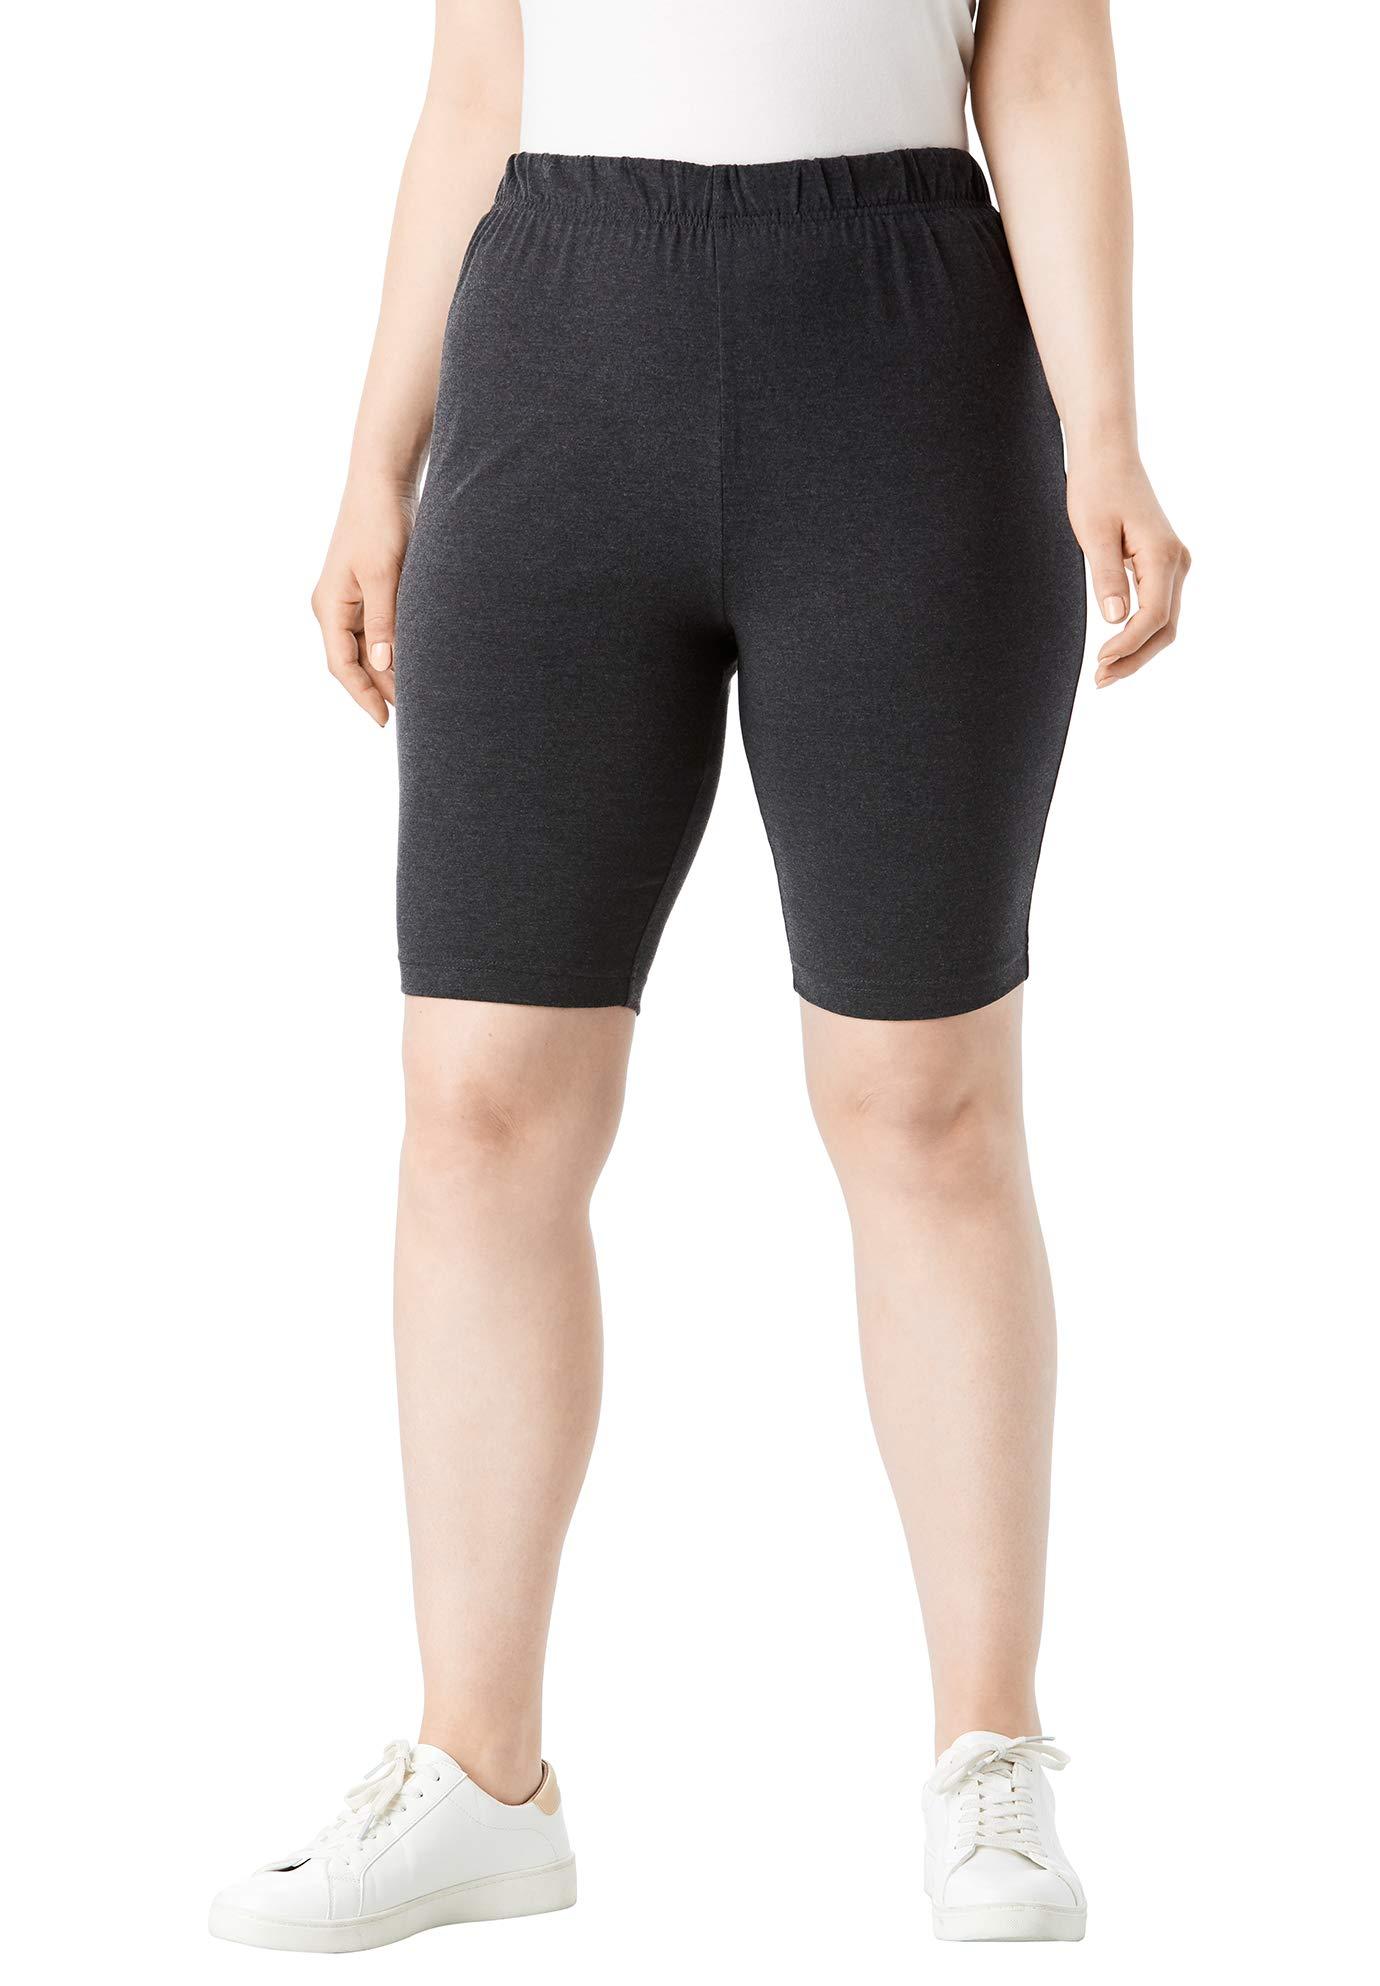 Roamans Women's Plus Size Essential Stretch Bike Short - Heather Charcoal, M by Roamans